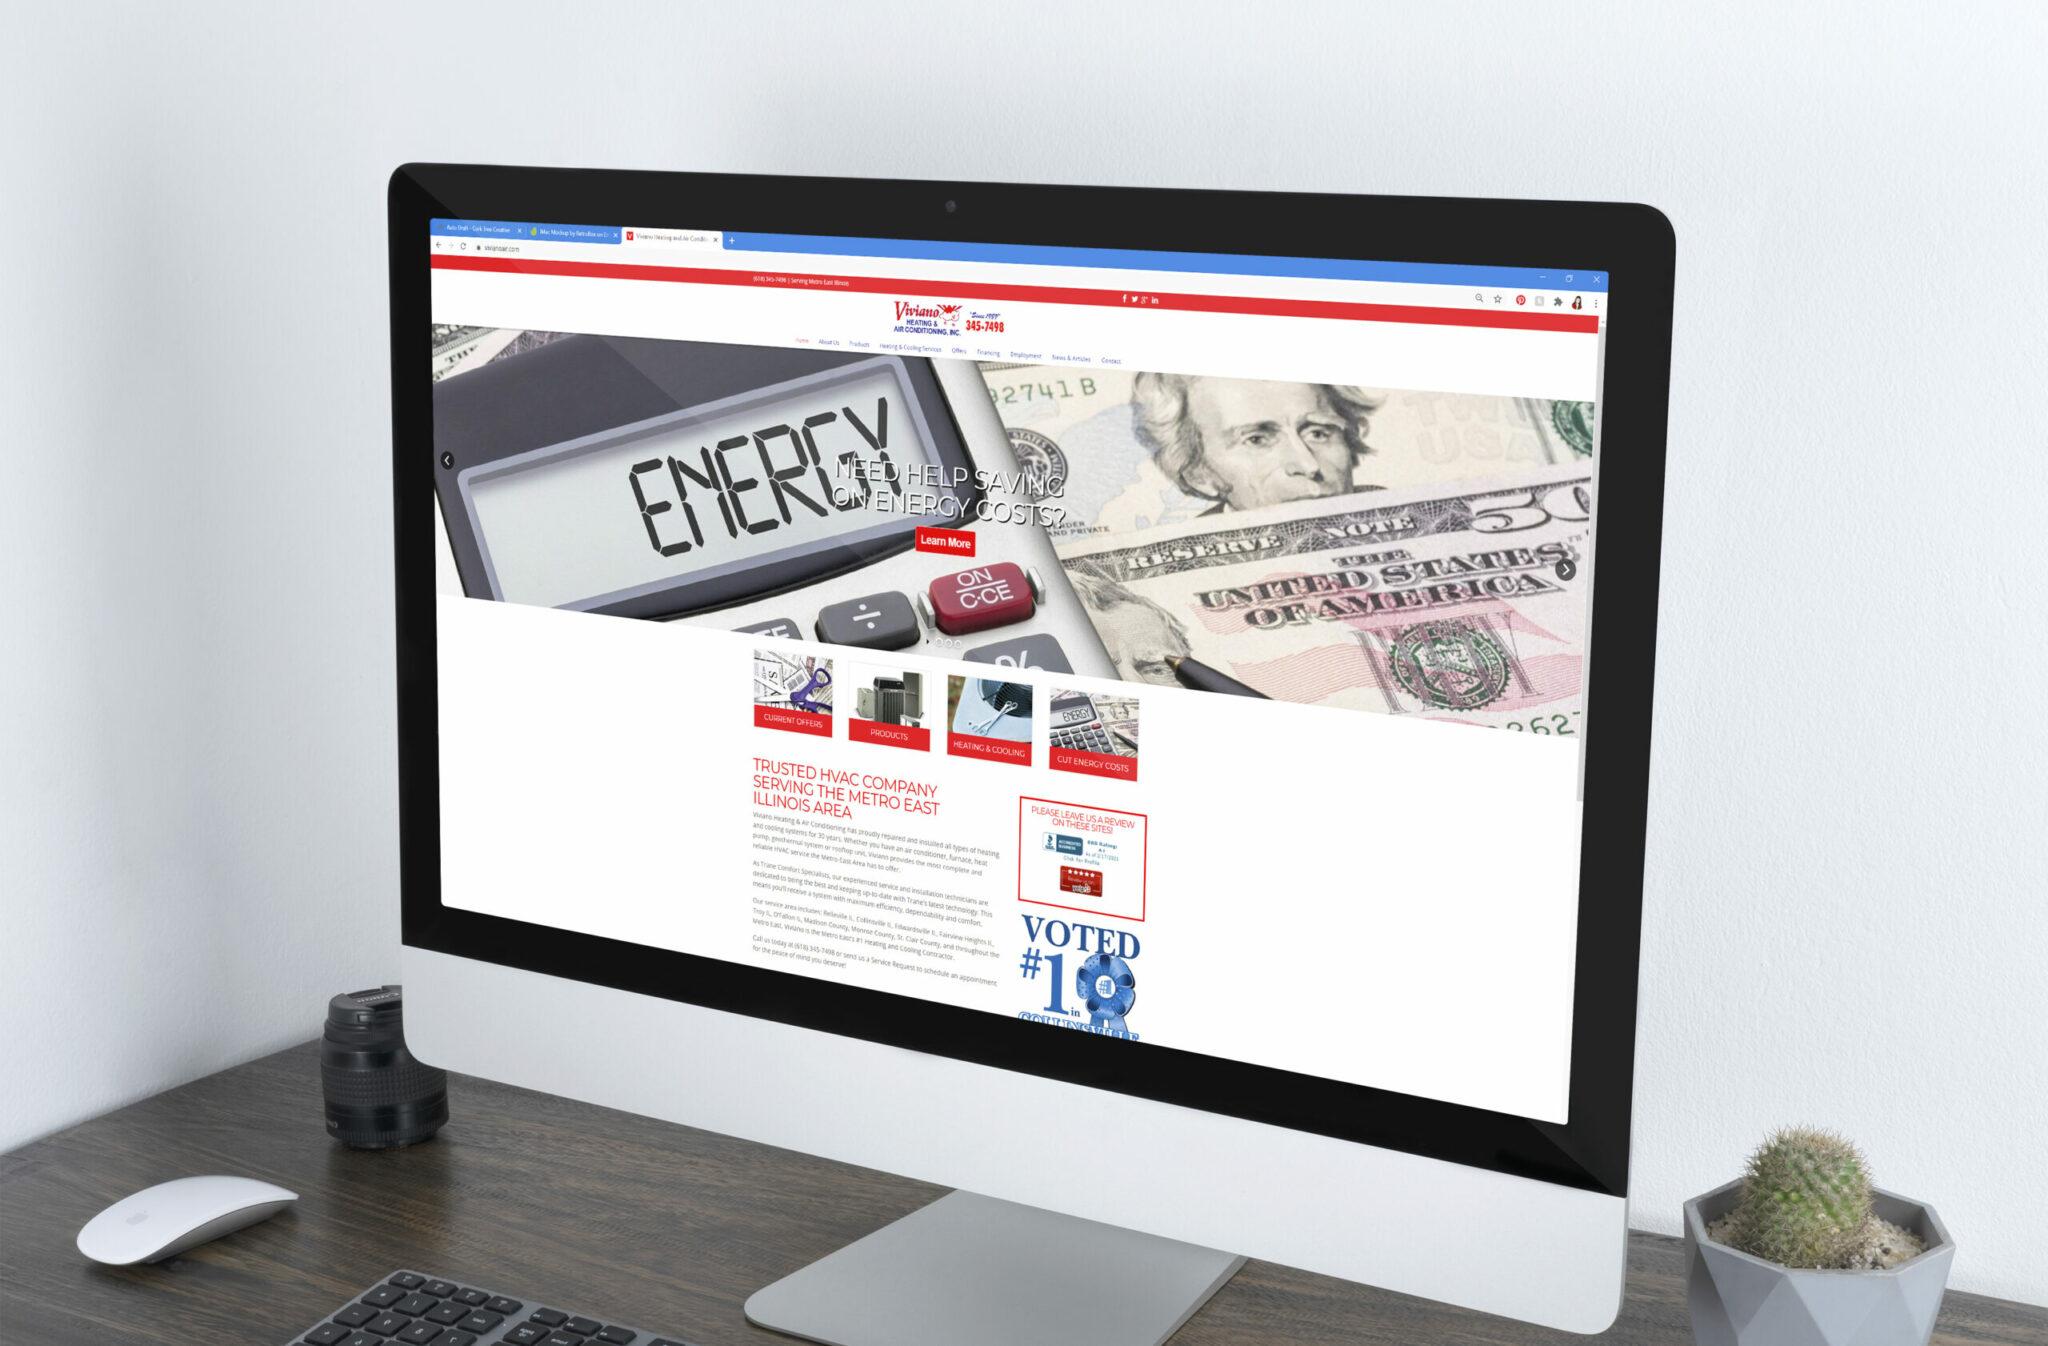 Viviano website on an iMac desktop computer